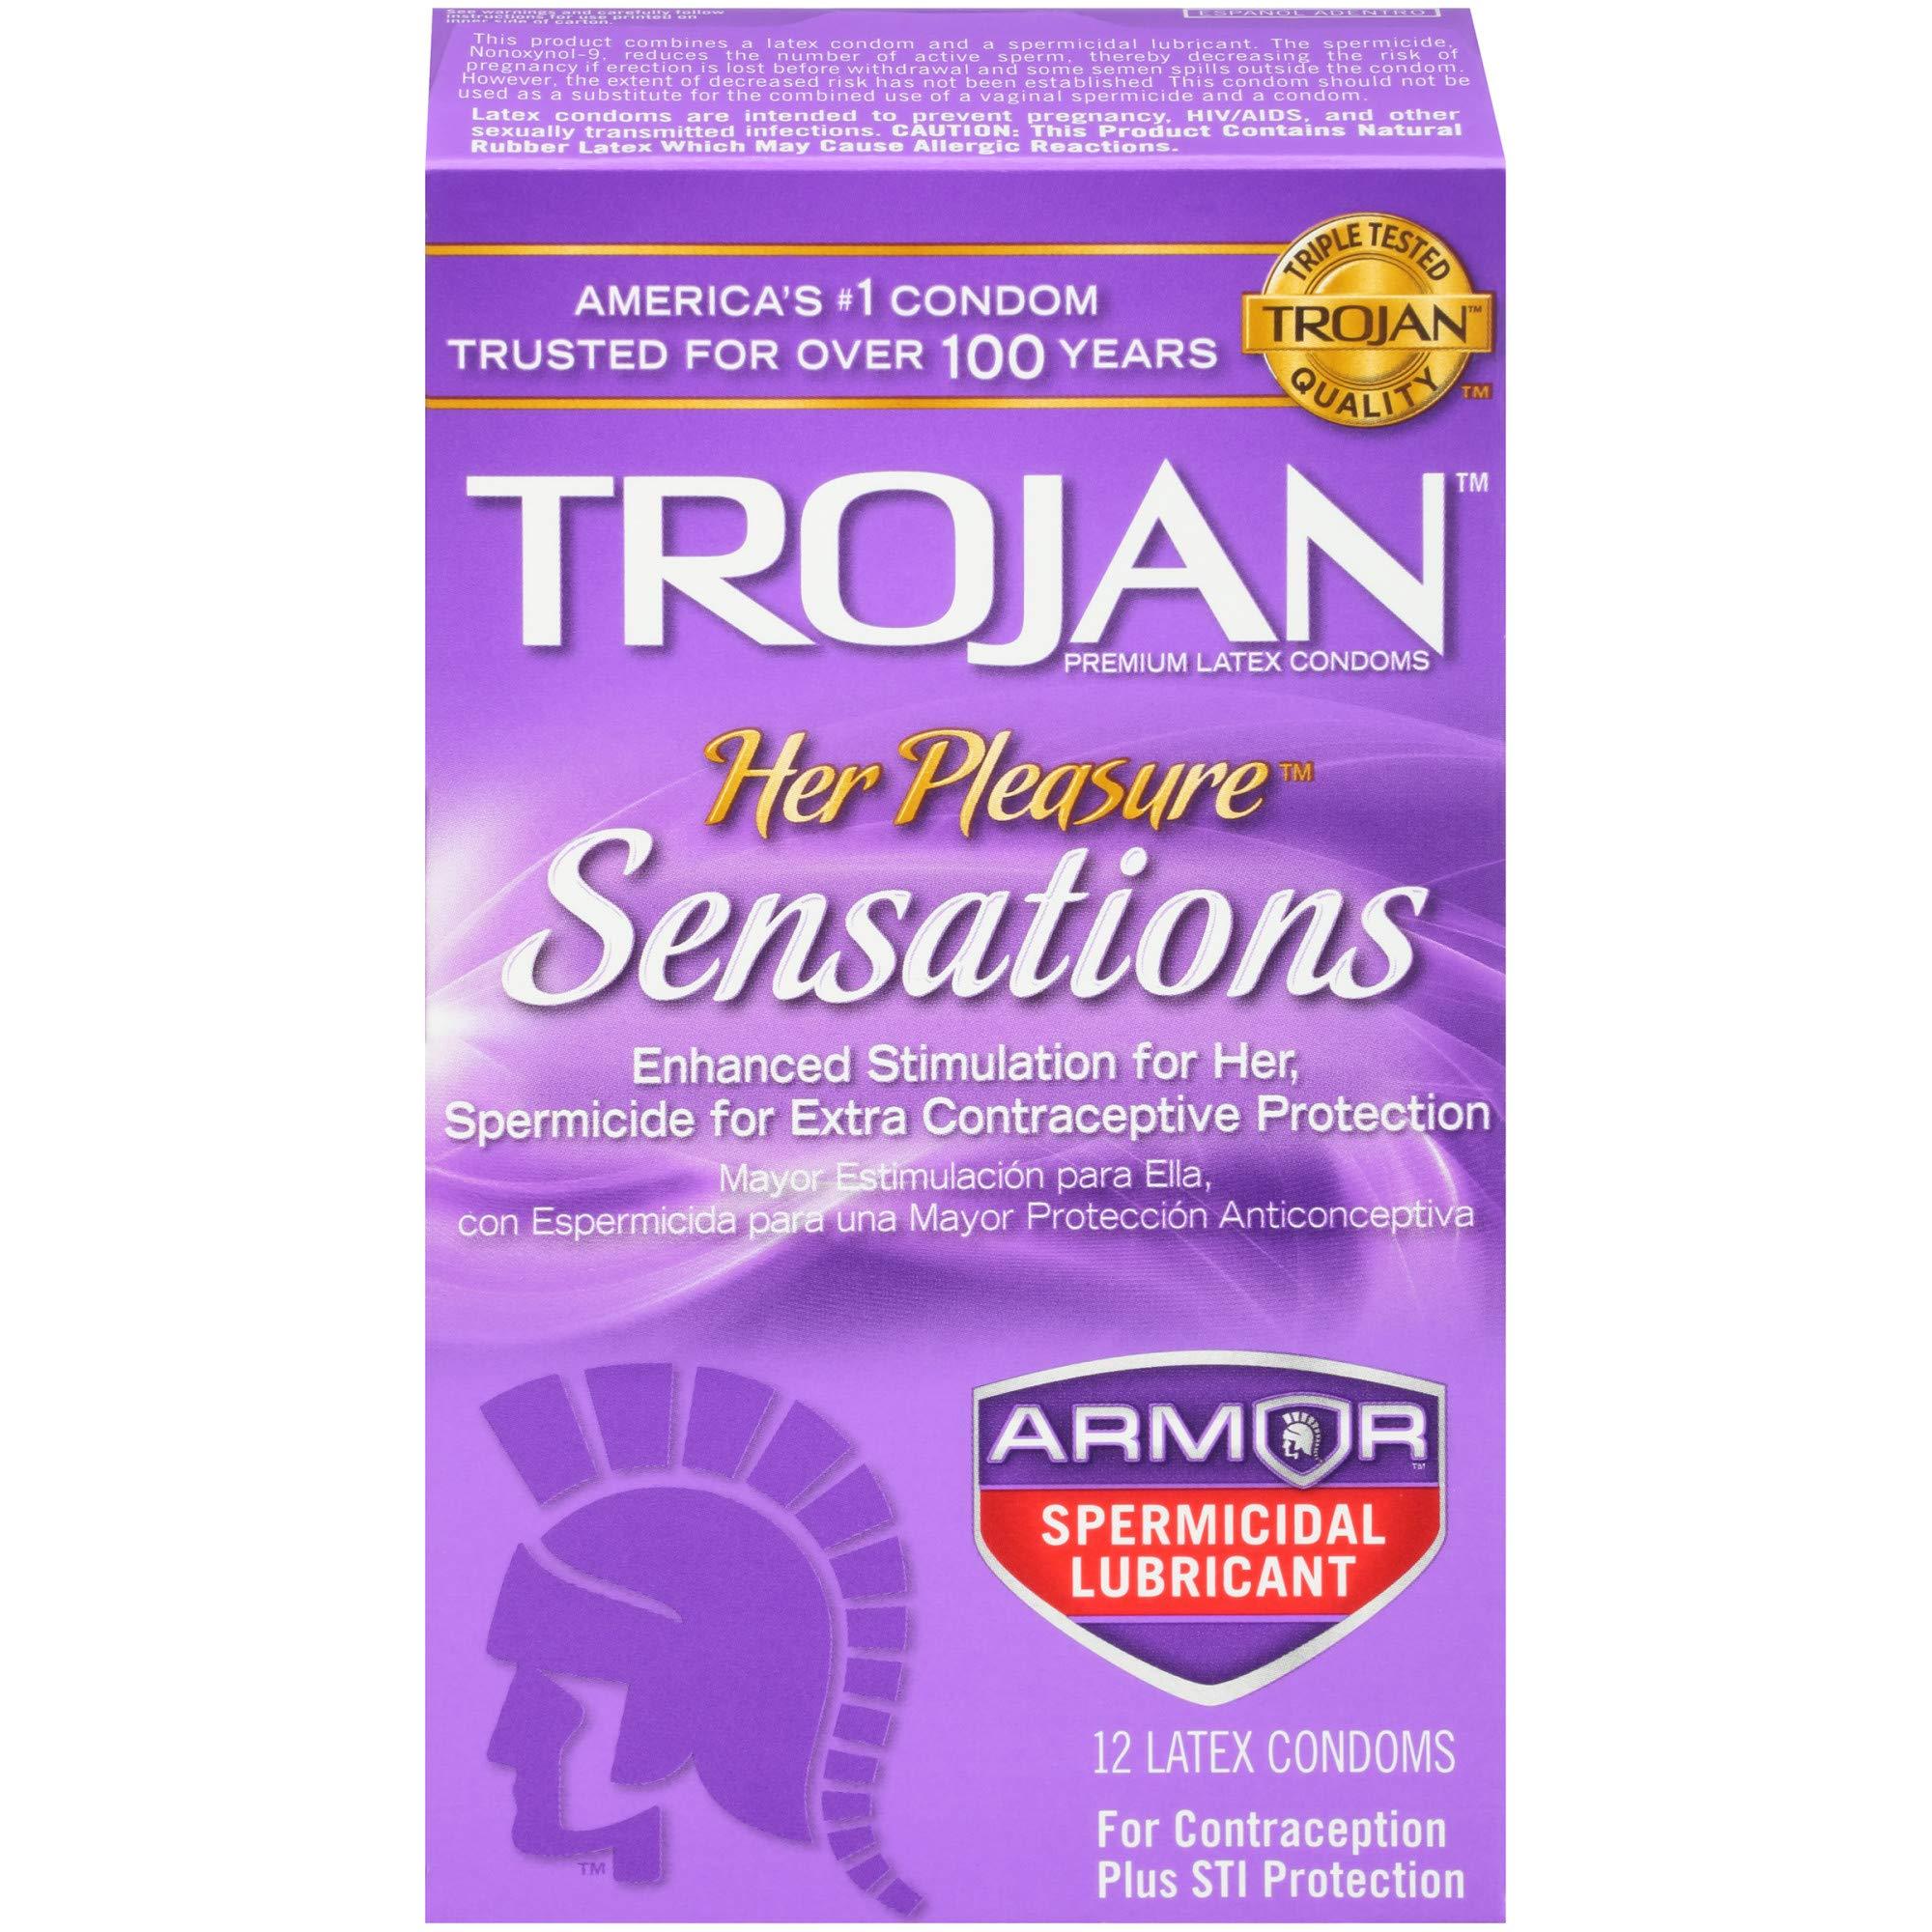 Trojan Pleasure Sensations Spermicidal Condoms